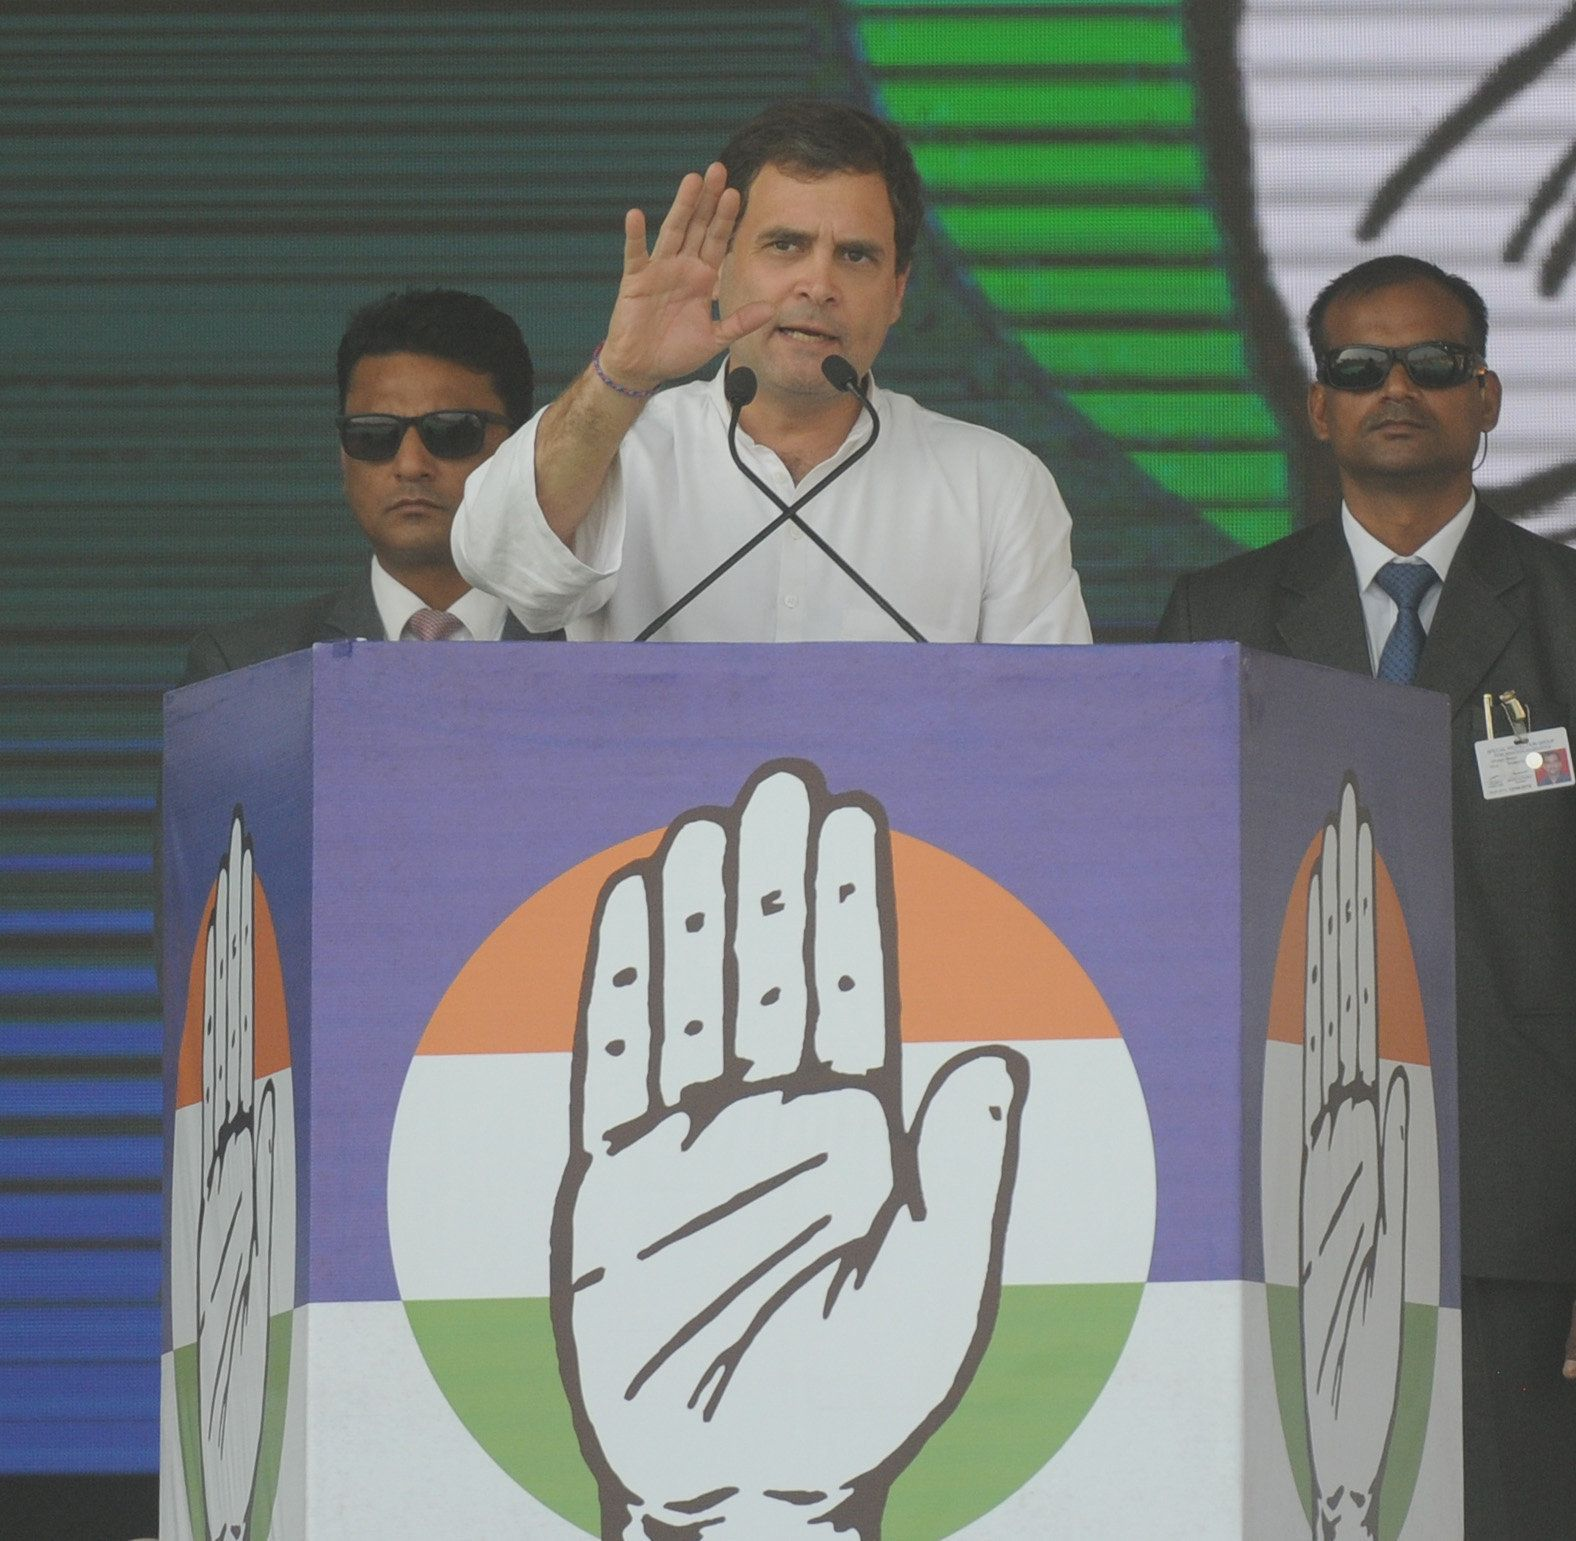 Rahul Gandhi Calls Mamata Banerjee To Extend